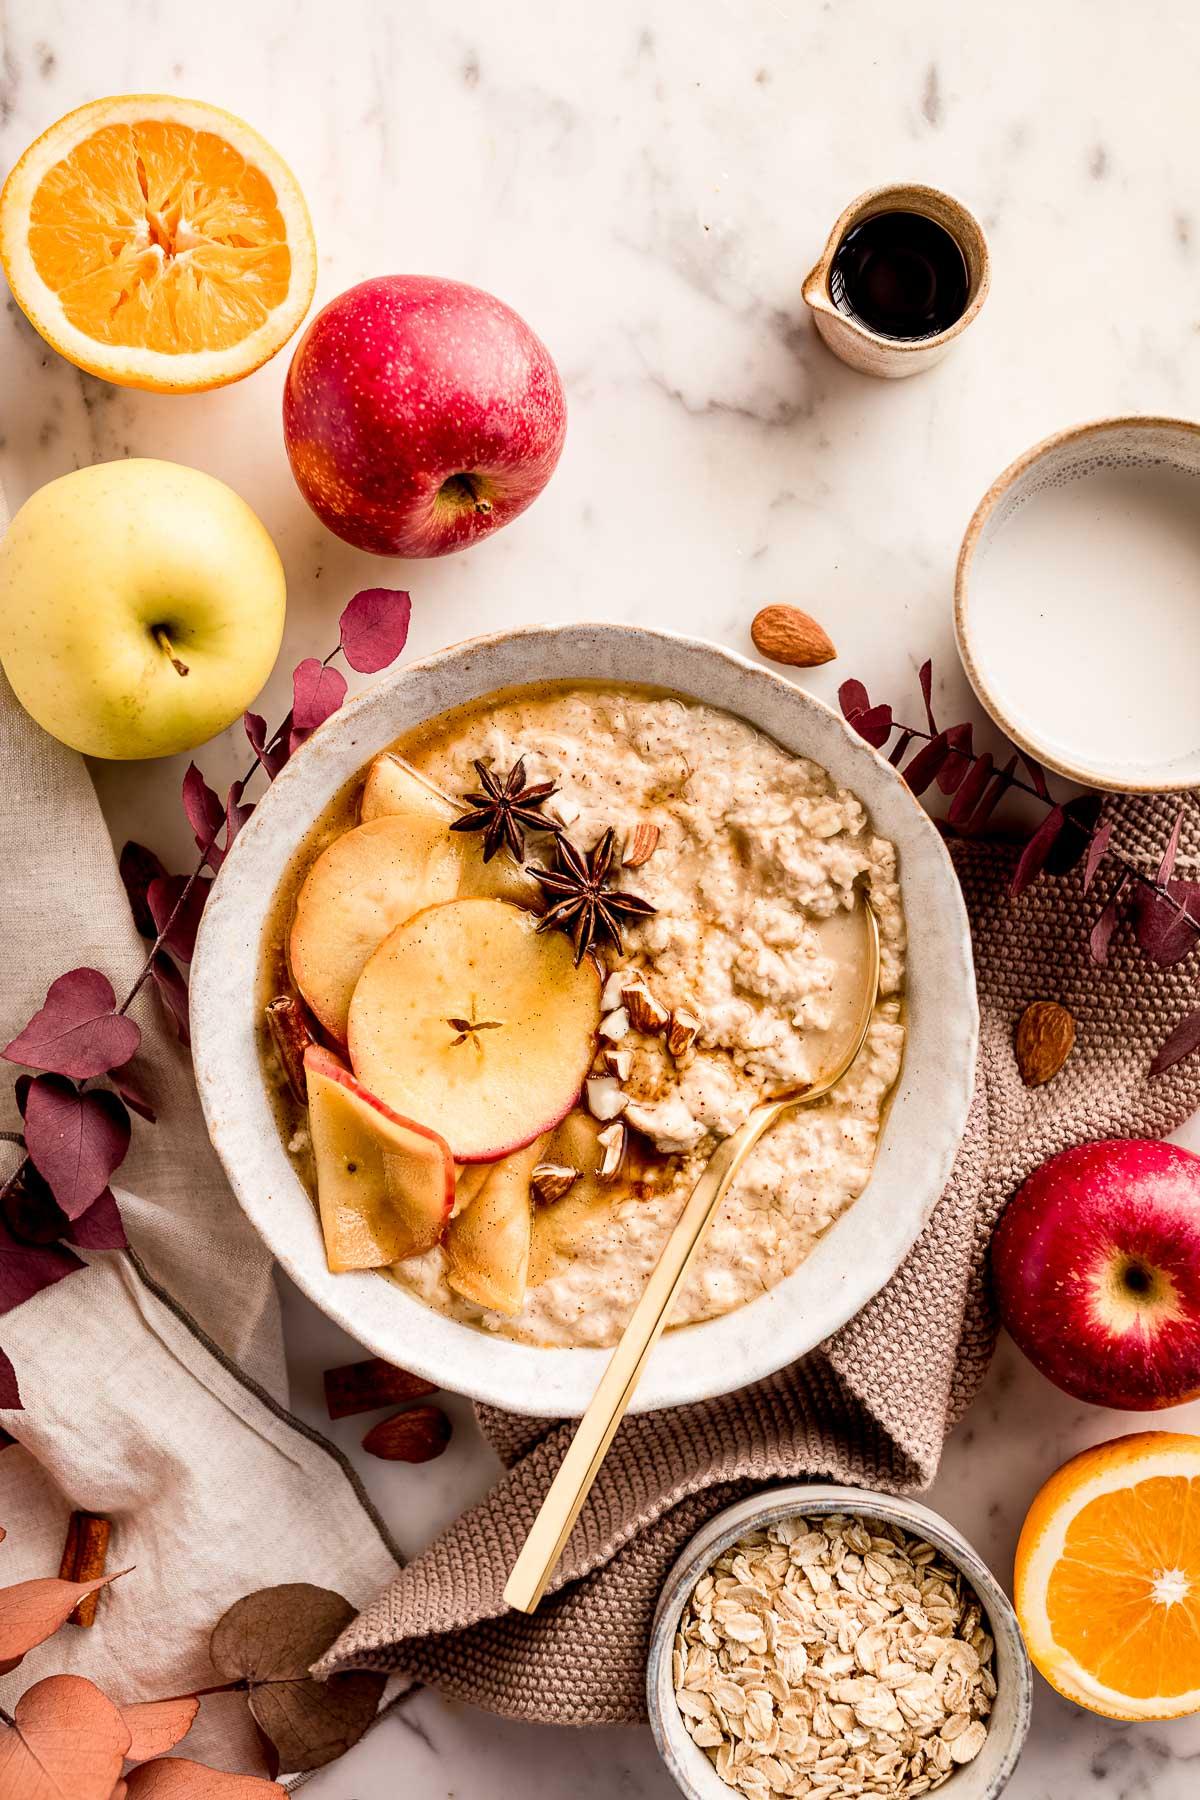 CREAMY apple pie oatmeal recipe gluten-free ricetta porridge alle mele e cannella cremoso porridge torta di mele light vegan senza glutine